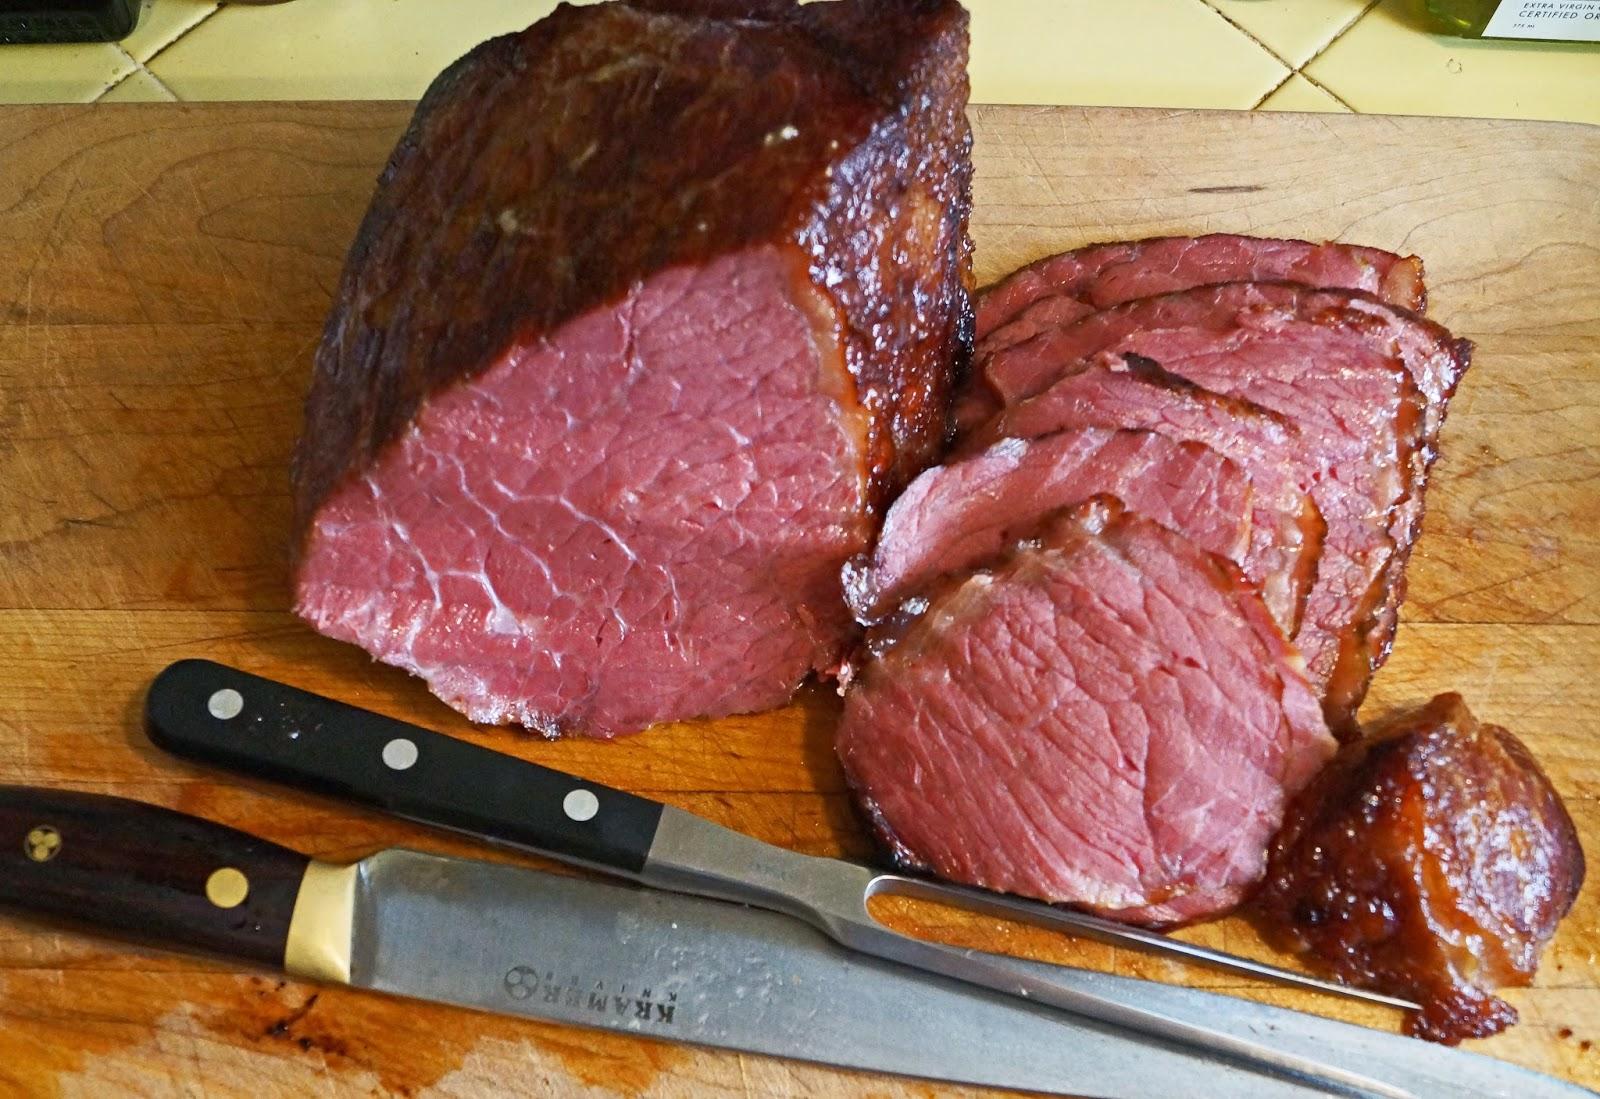 MAD MEAT GENIUS: KOBE CORNED BEEF